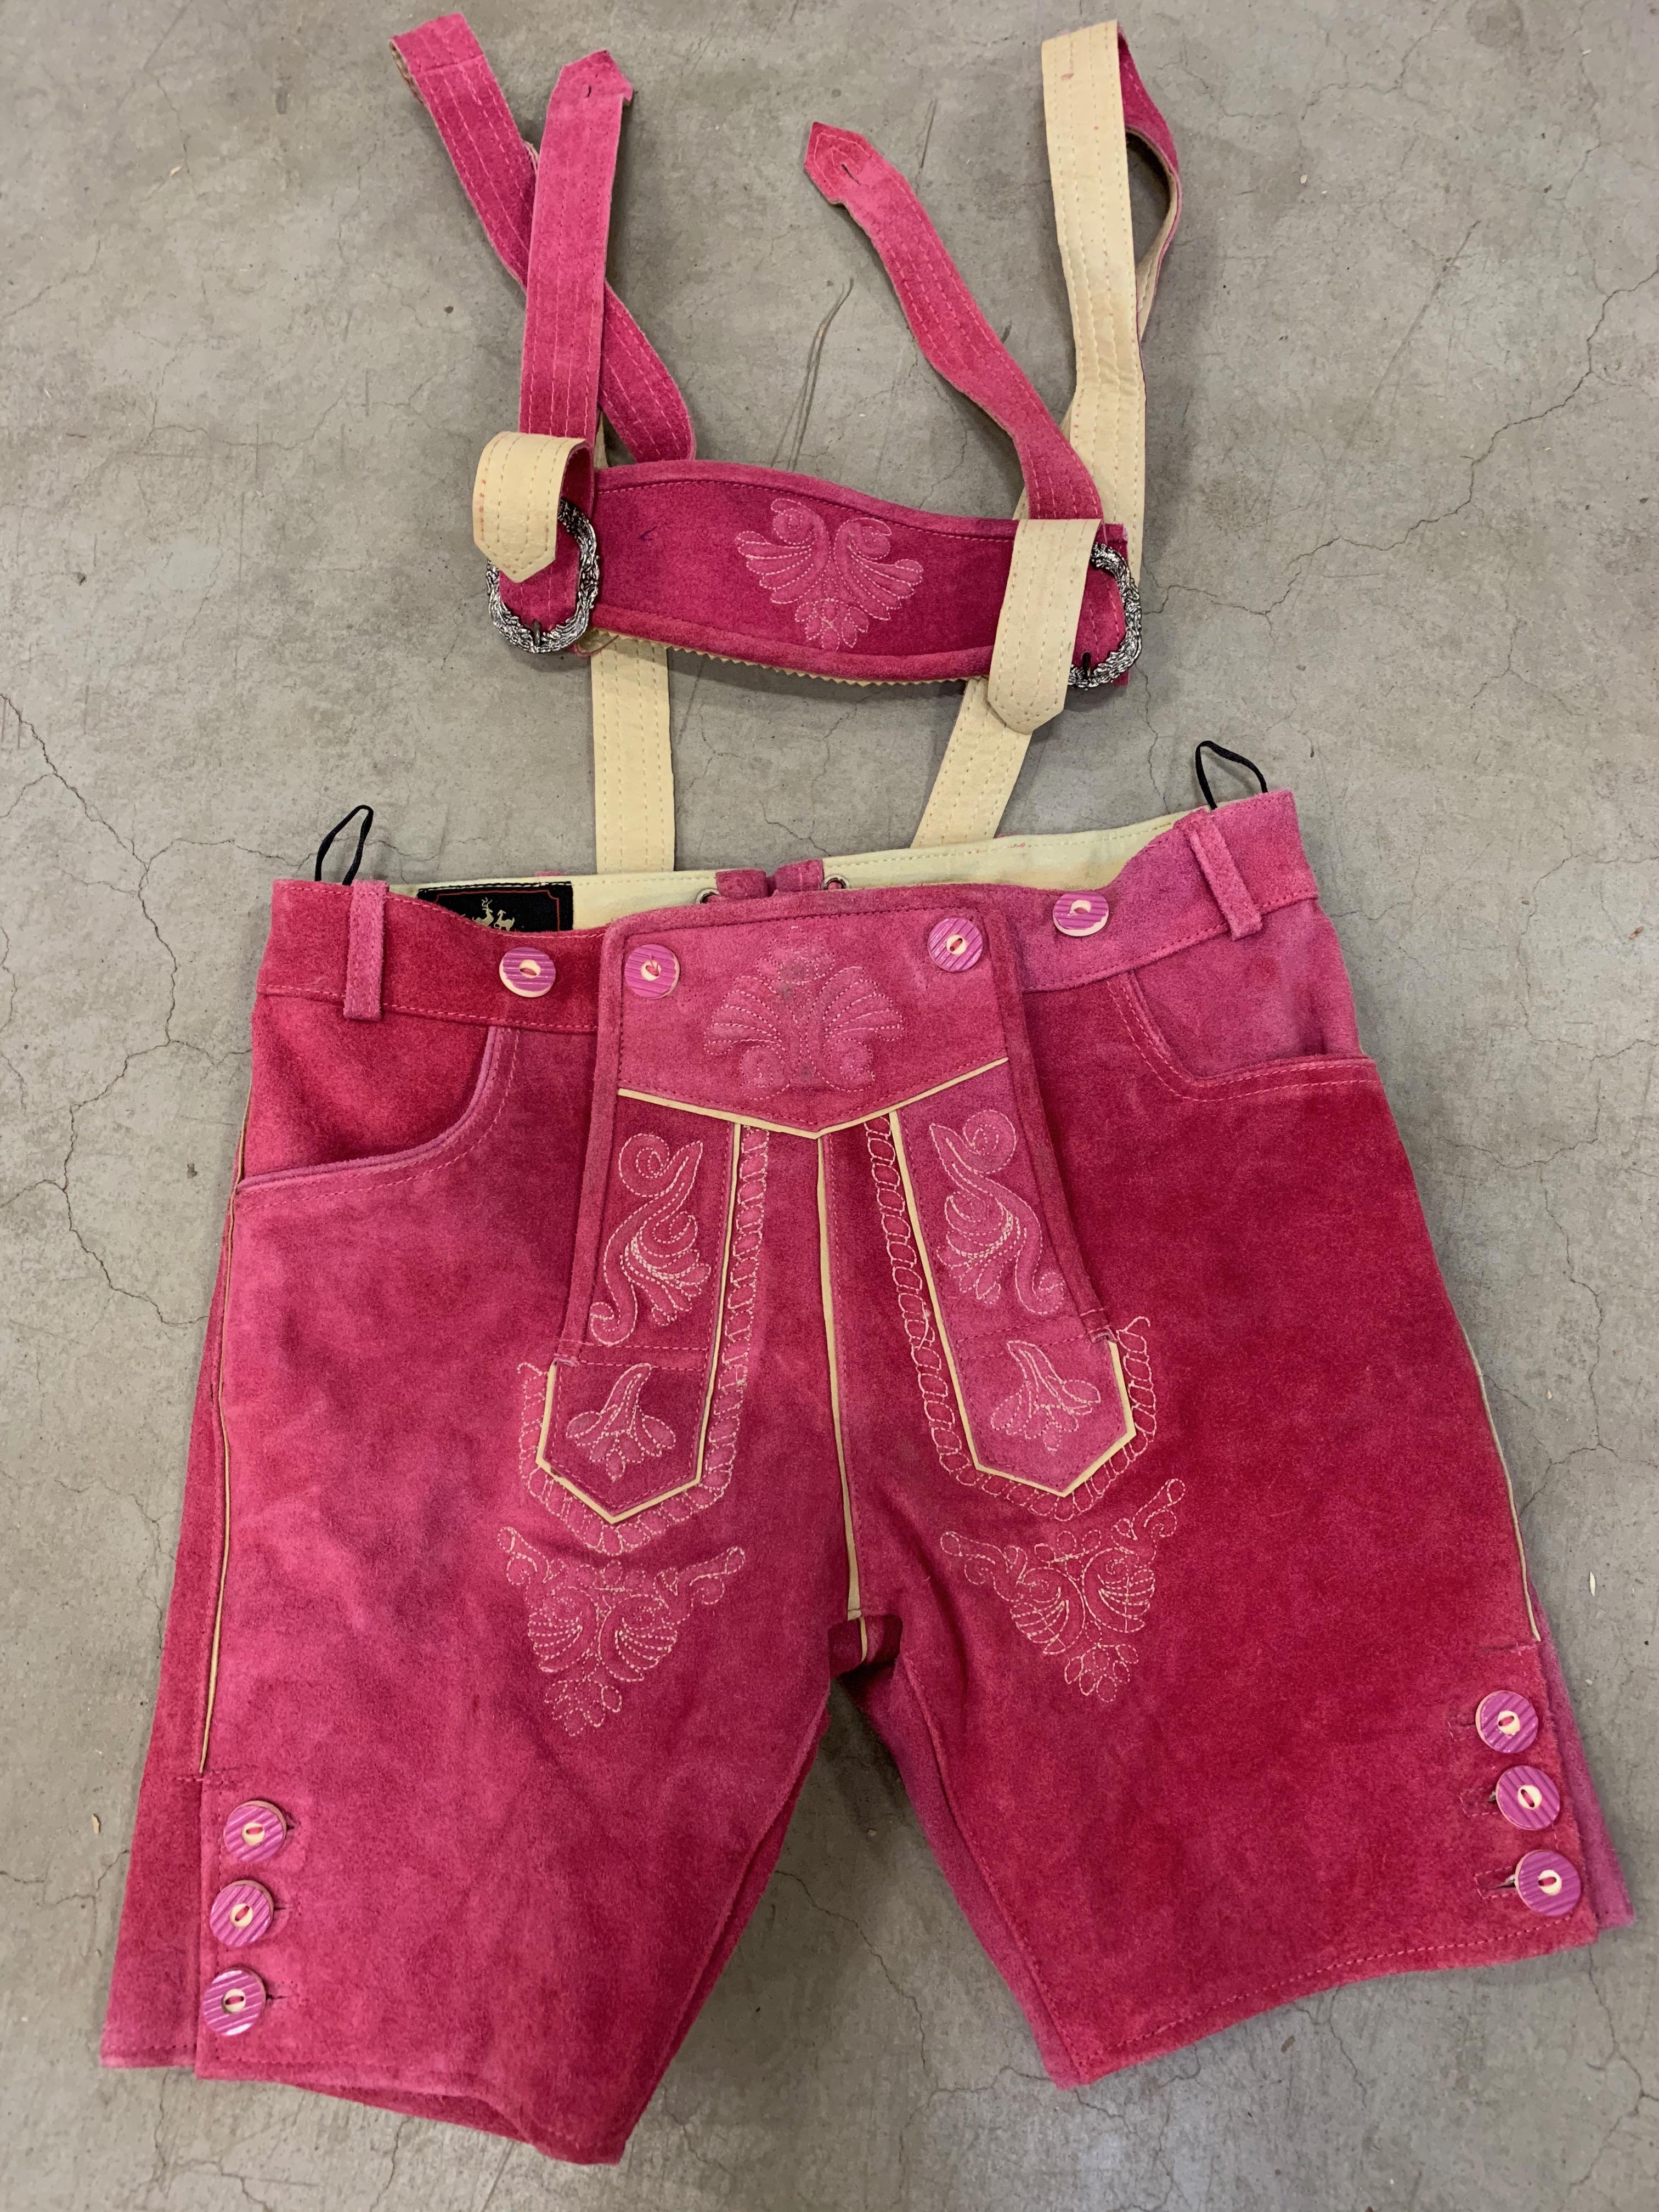 Lederhose Babette lila (Artikel-Nr. 8042-014) Lederhose Babette pink (Artikel-Nr. 8042-008)